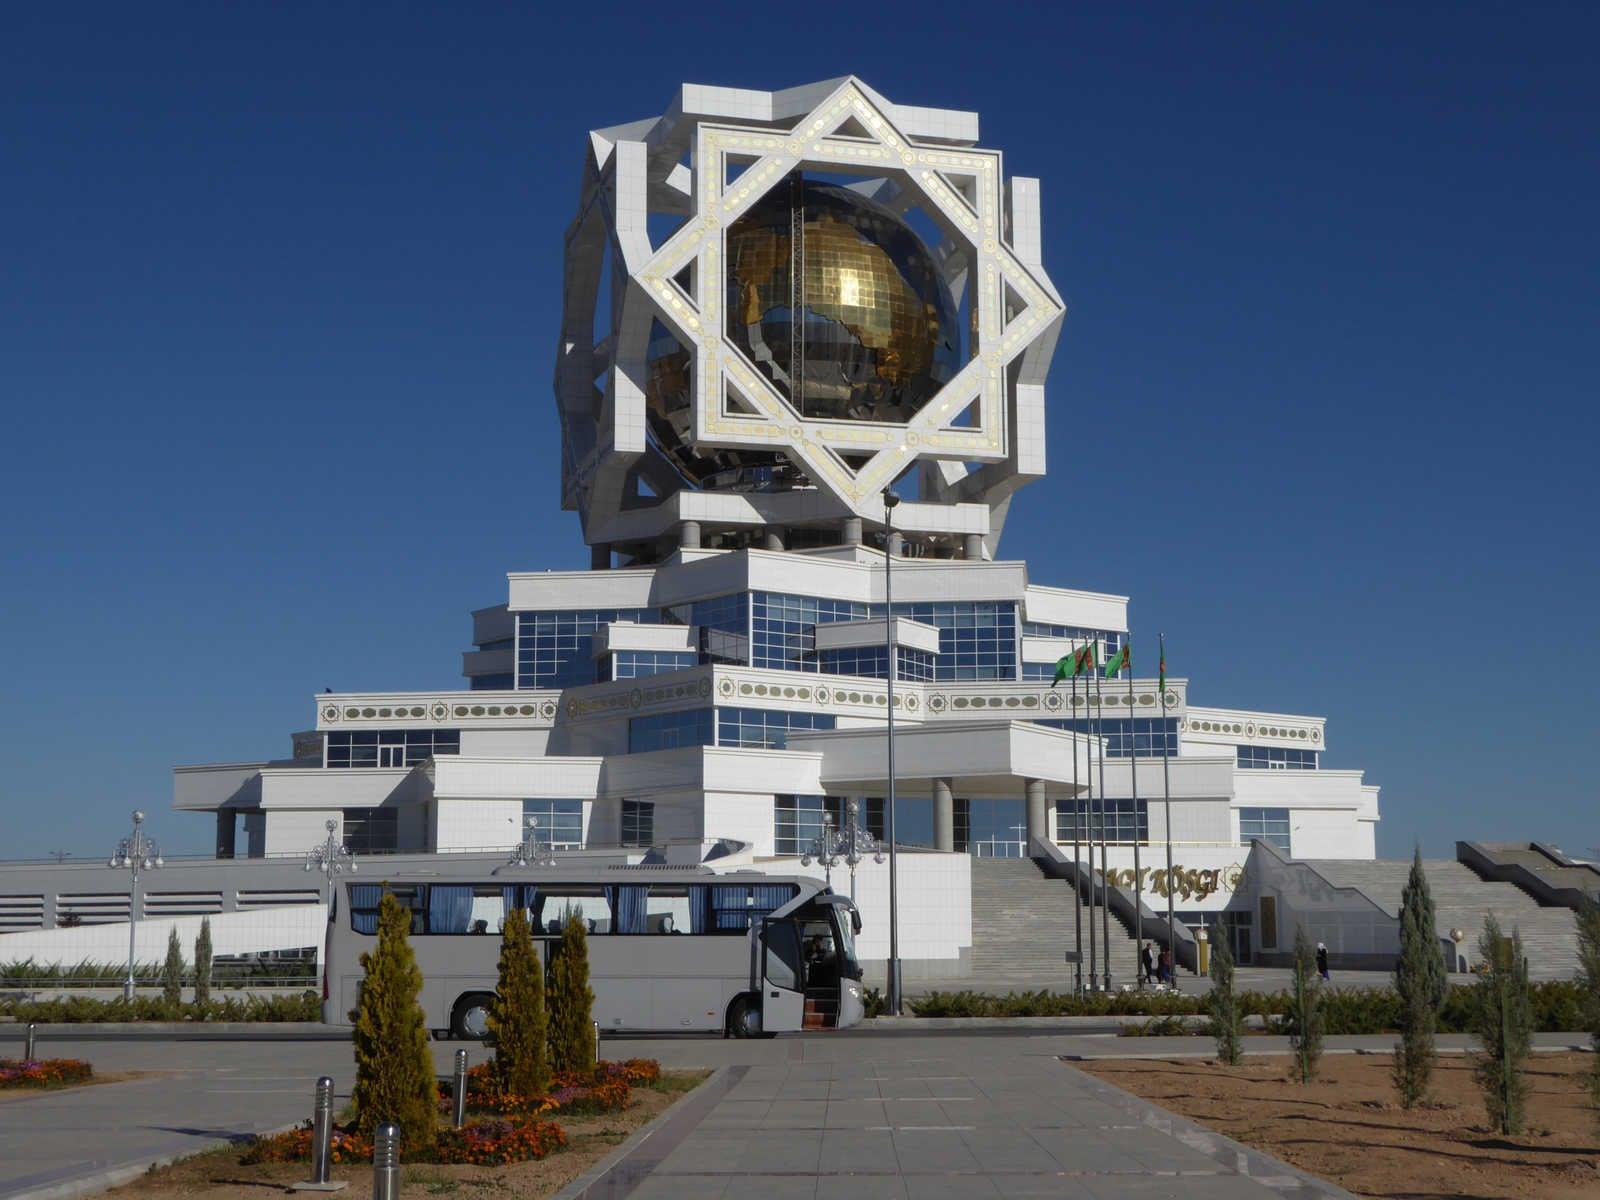 Capital de turkmenistan yahoo dating